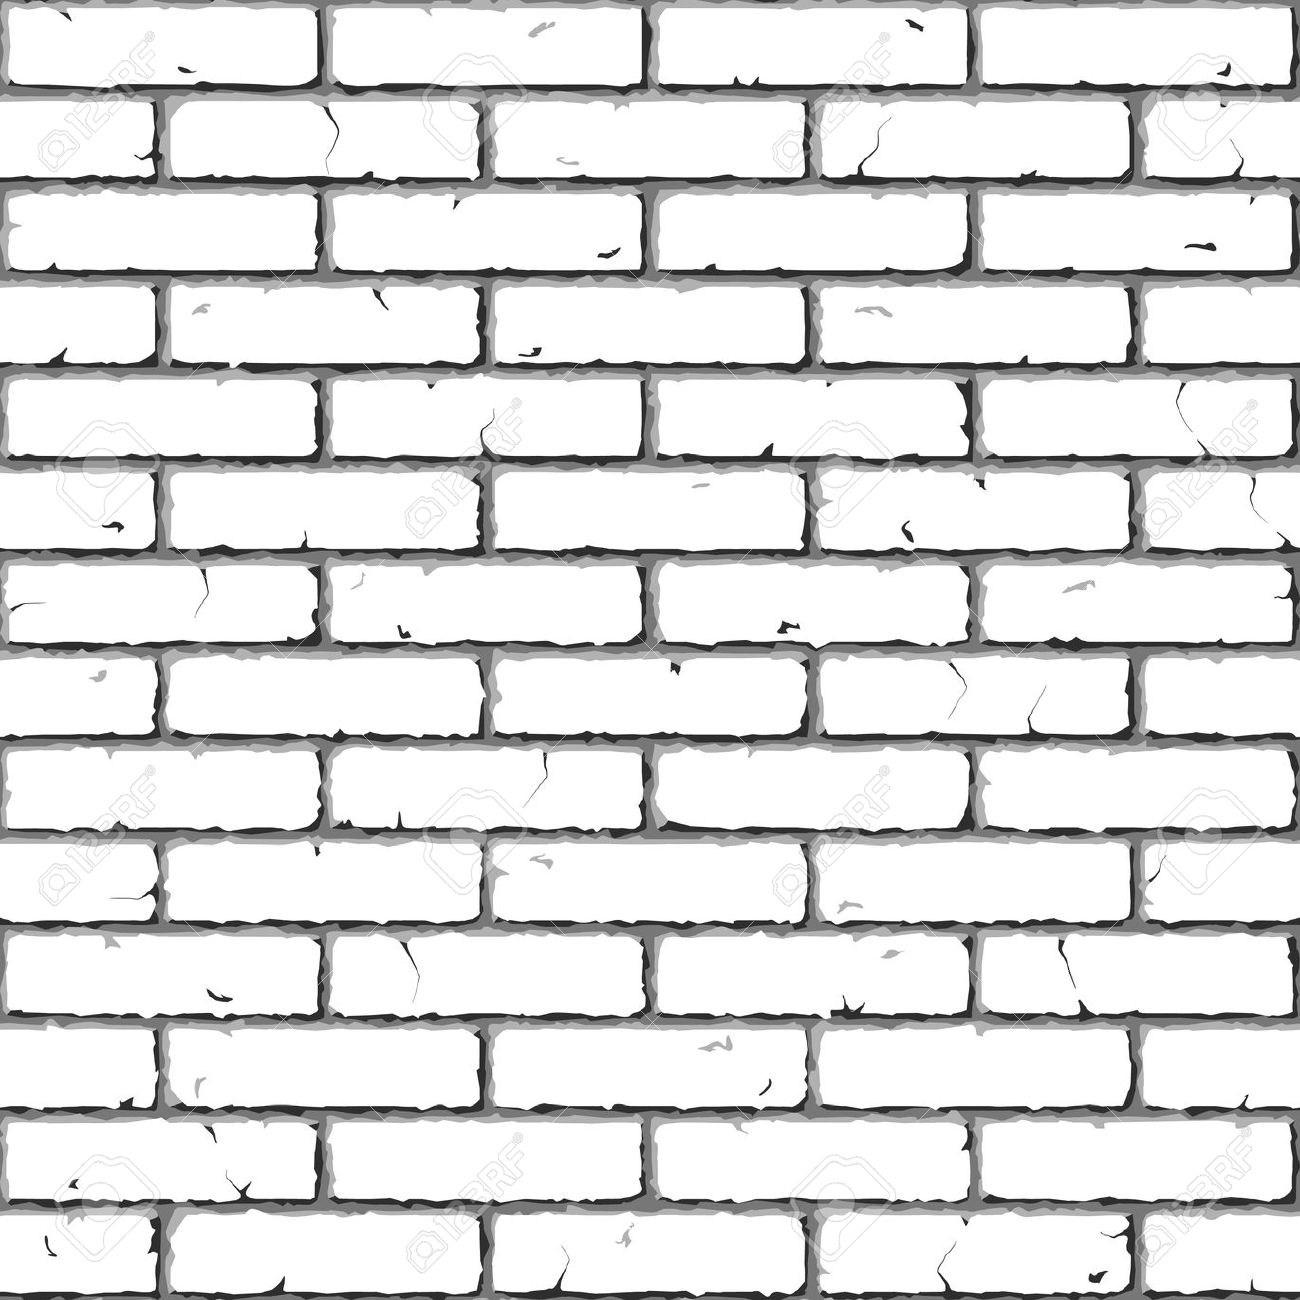 Brick clipart black and white 7 » Clipart Portal.